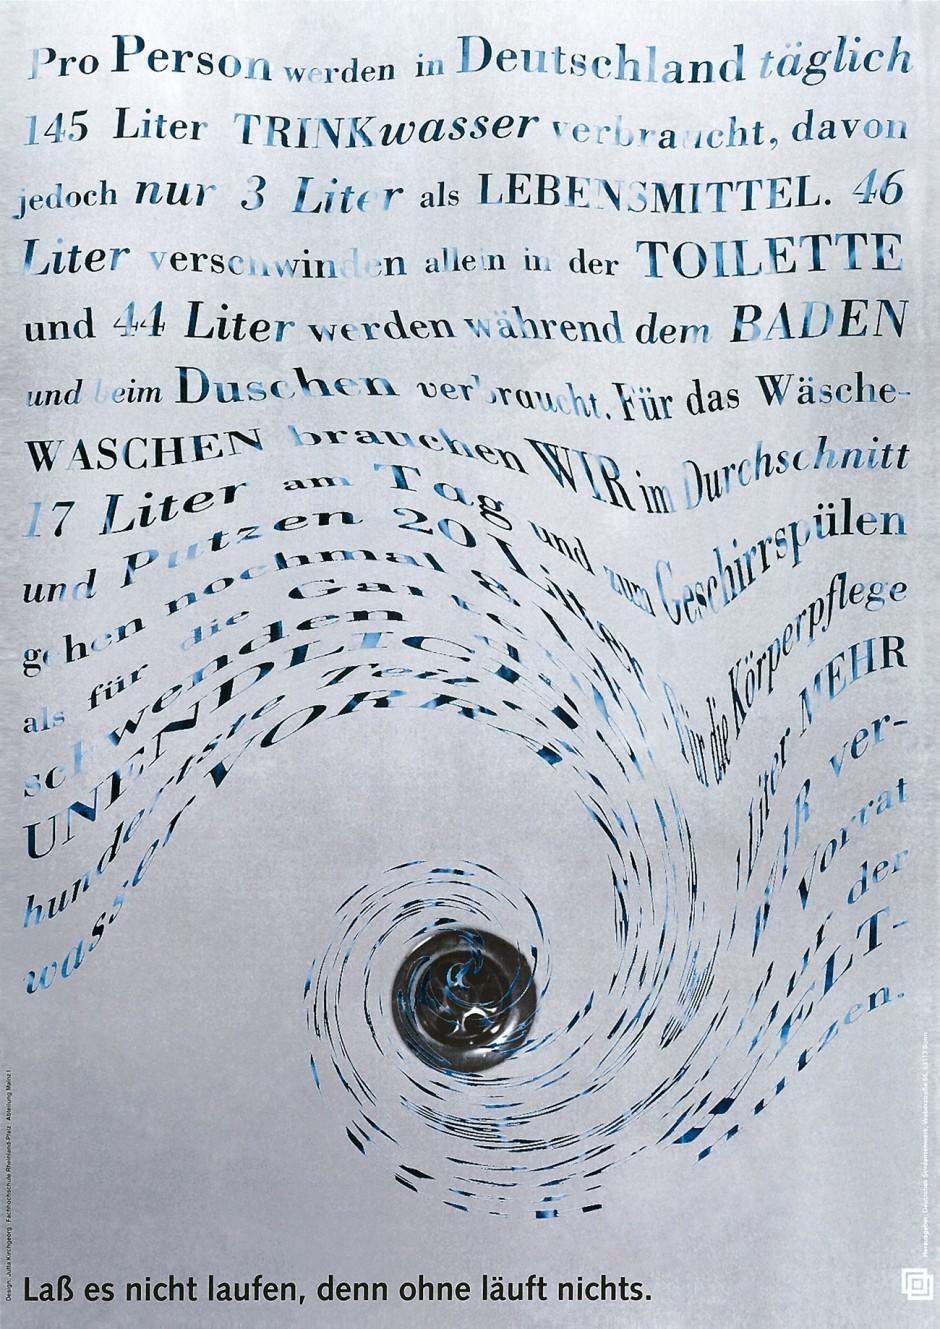 1994: Hochschule in ökologischer Bewegung / 1. Preis